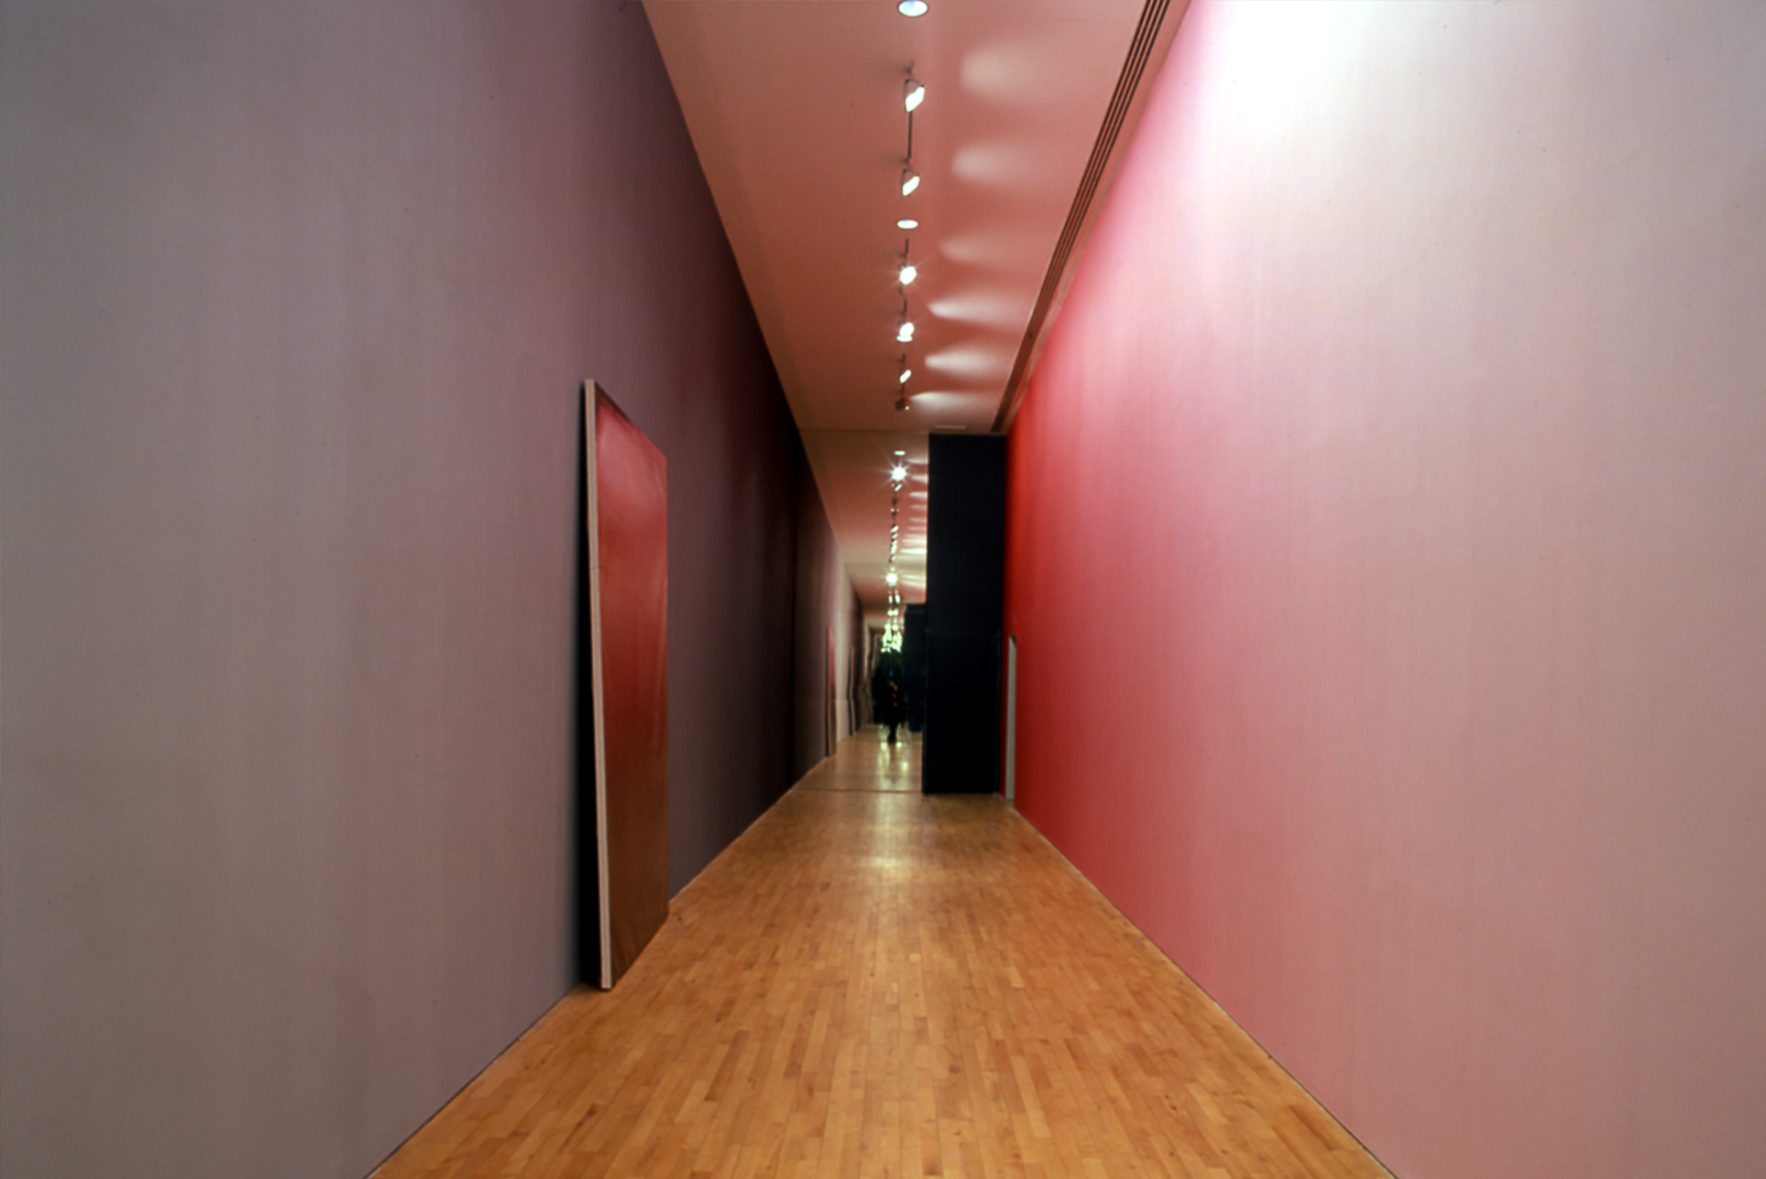 Untitled 01, 2003 |  | ProjecteSD